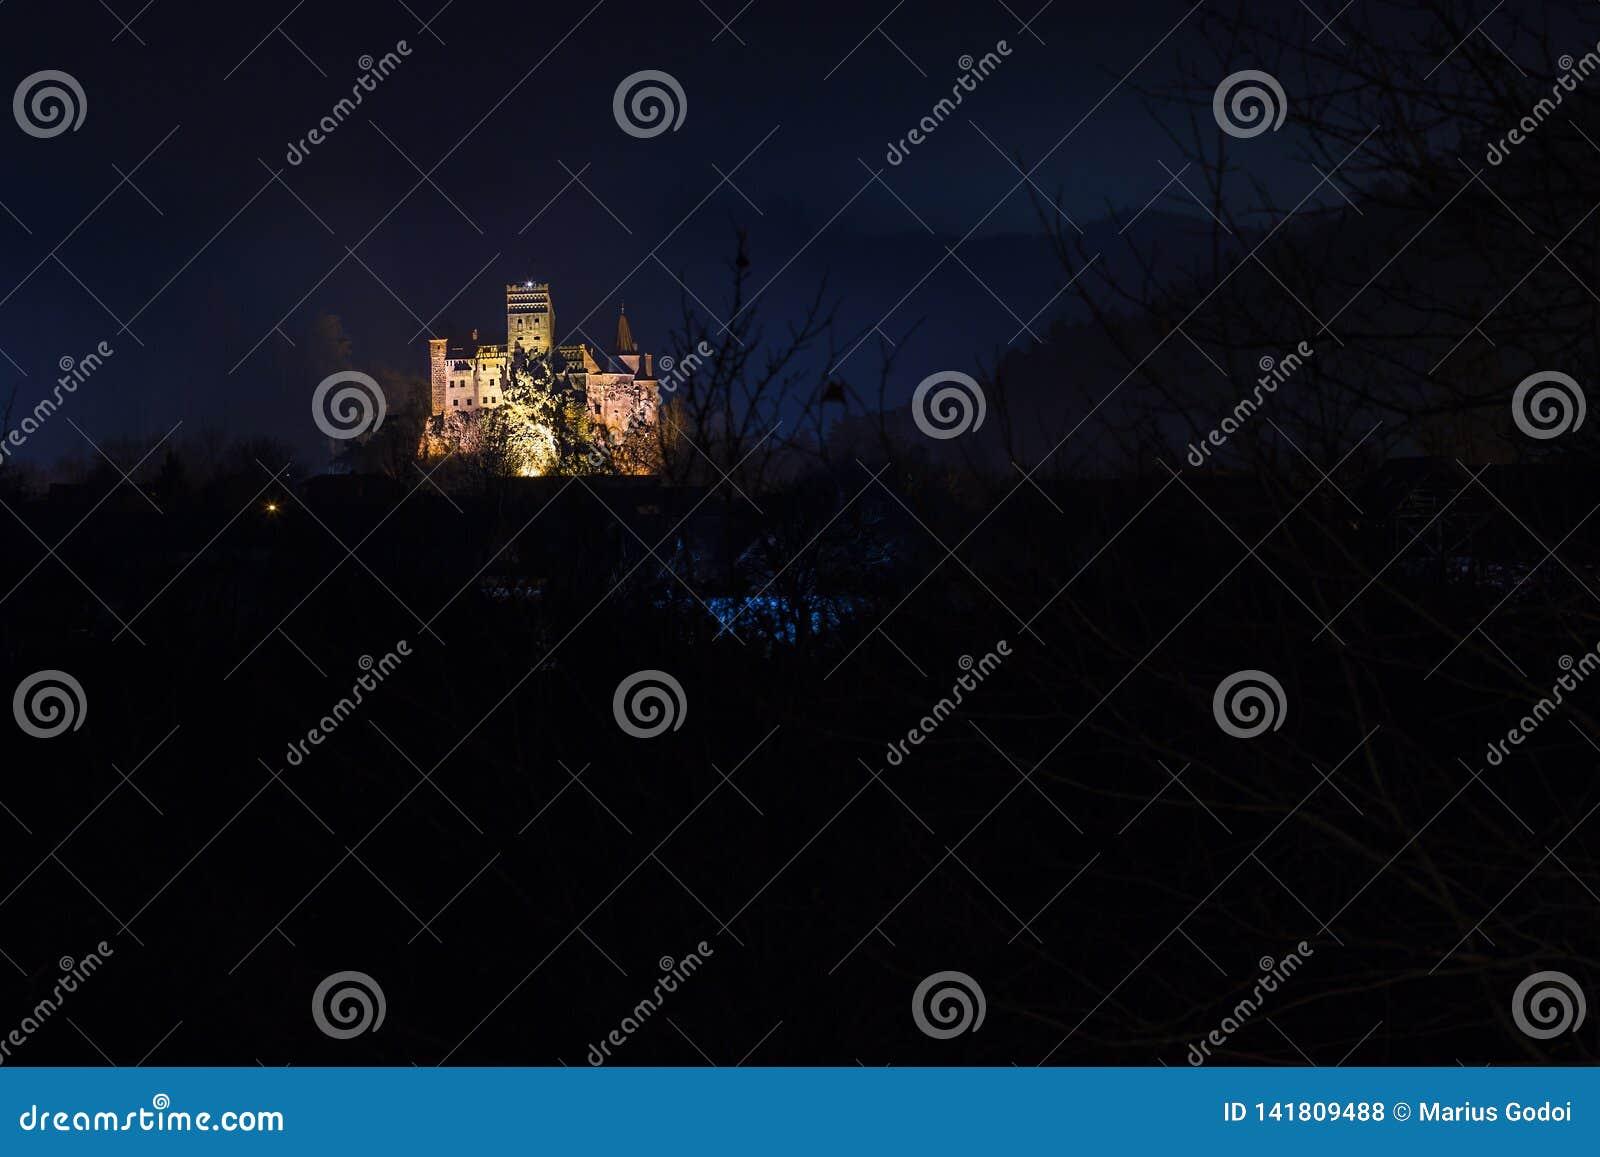 Famous Bran castle in Romania